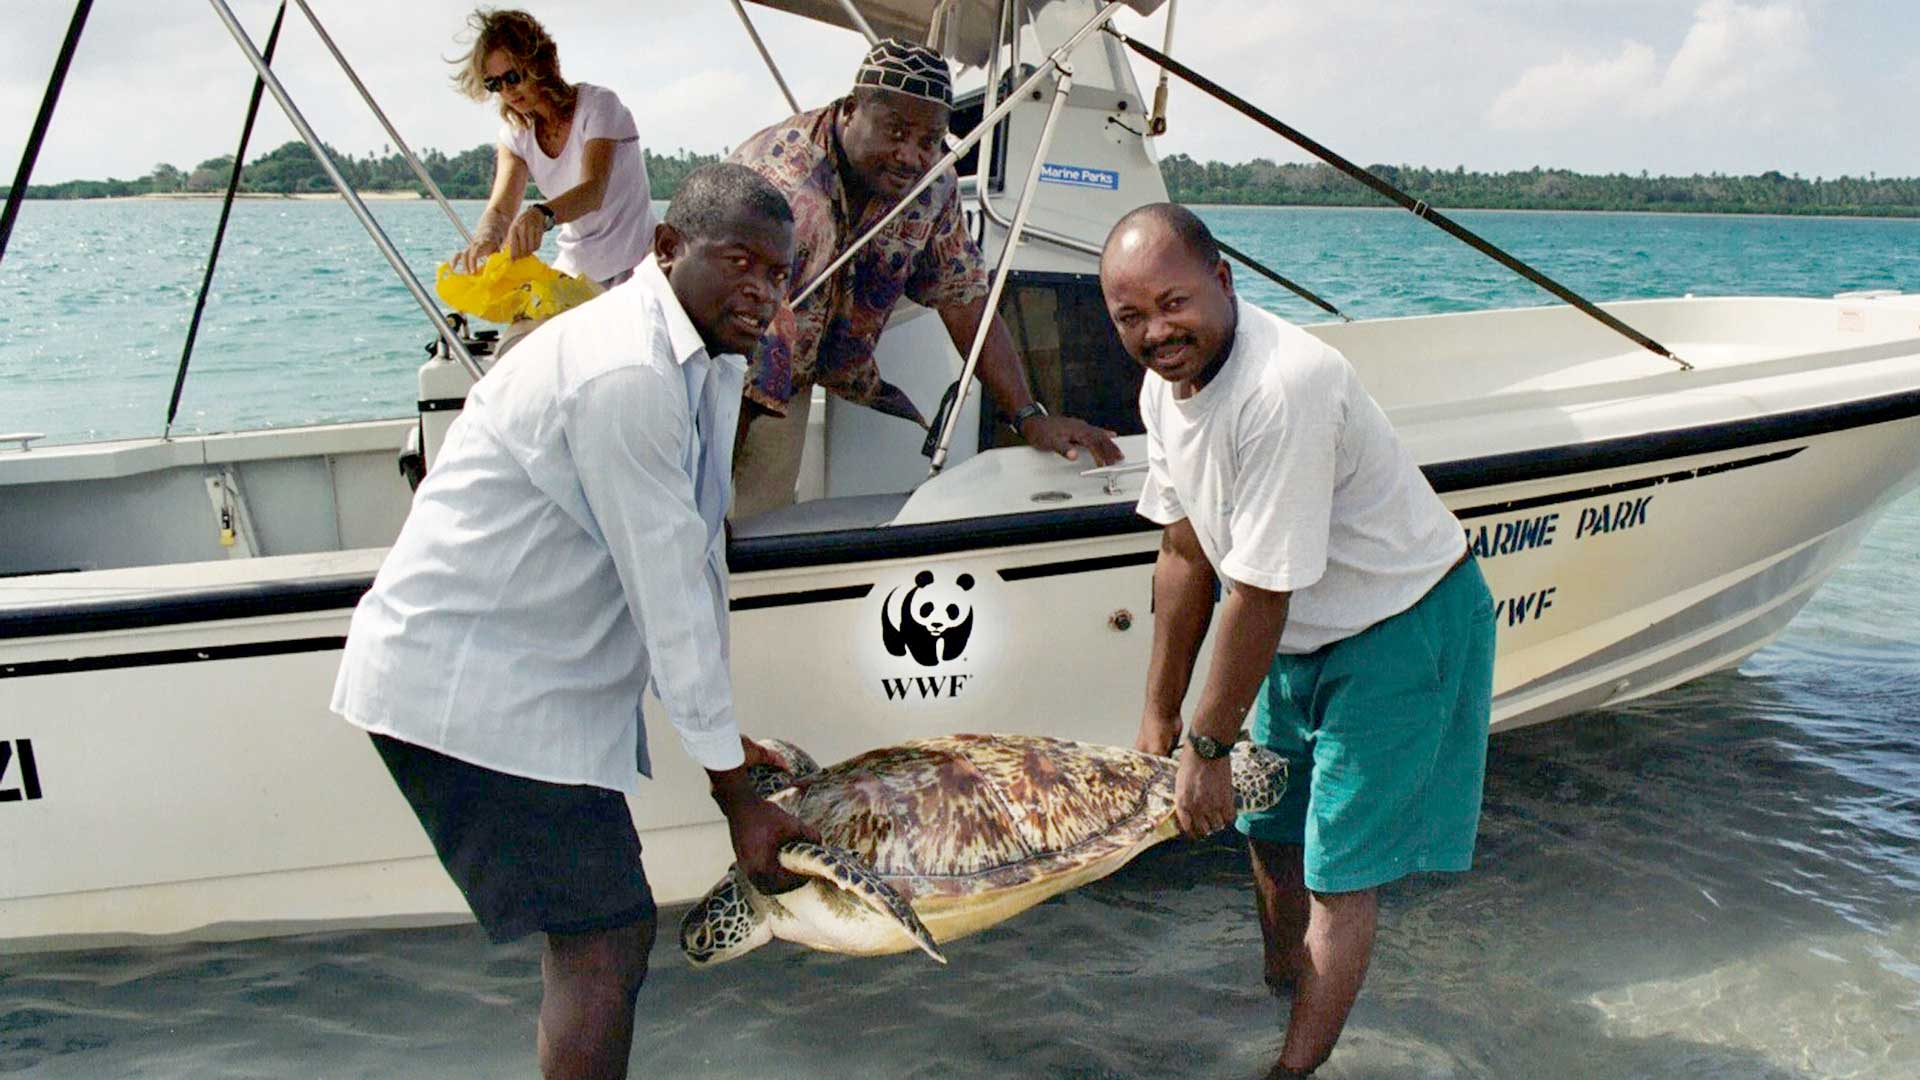 Meeresschildkröte durch den WWF gerettet